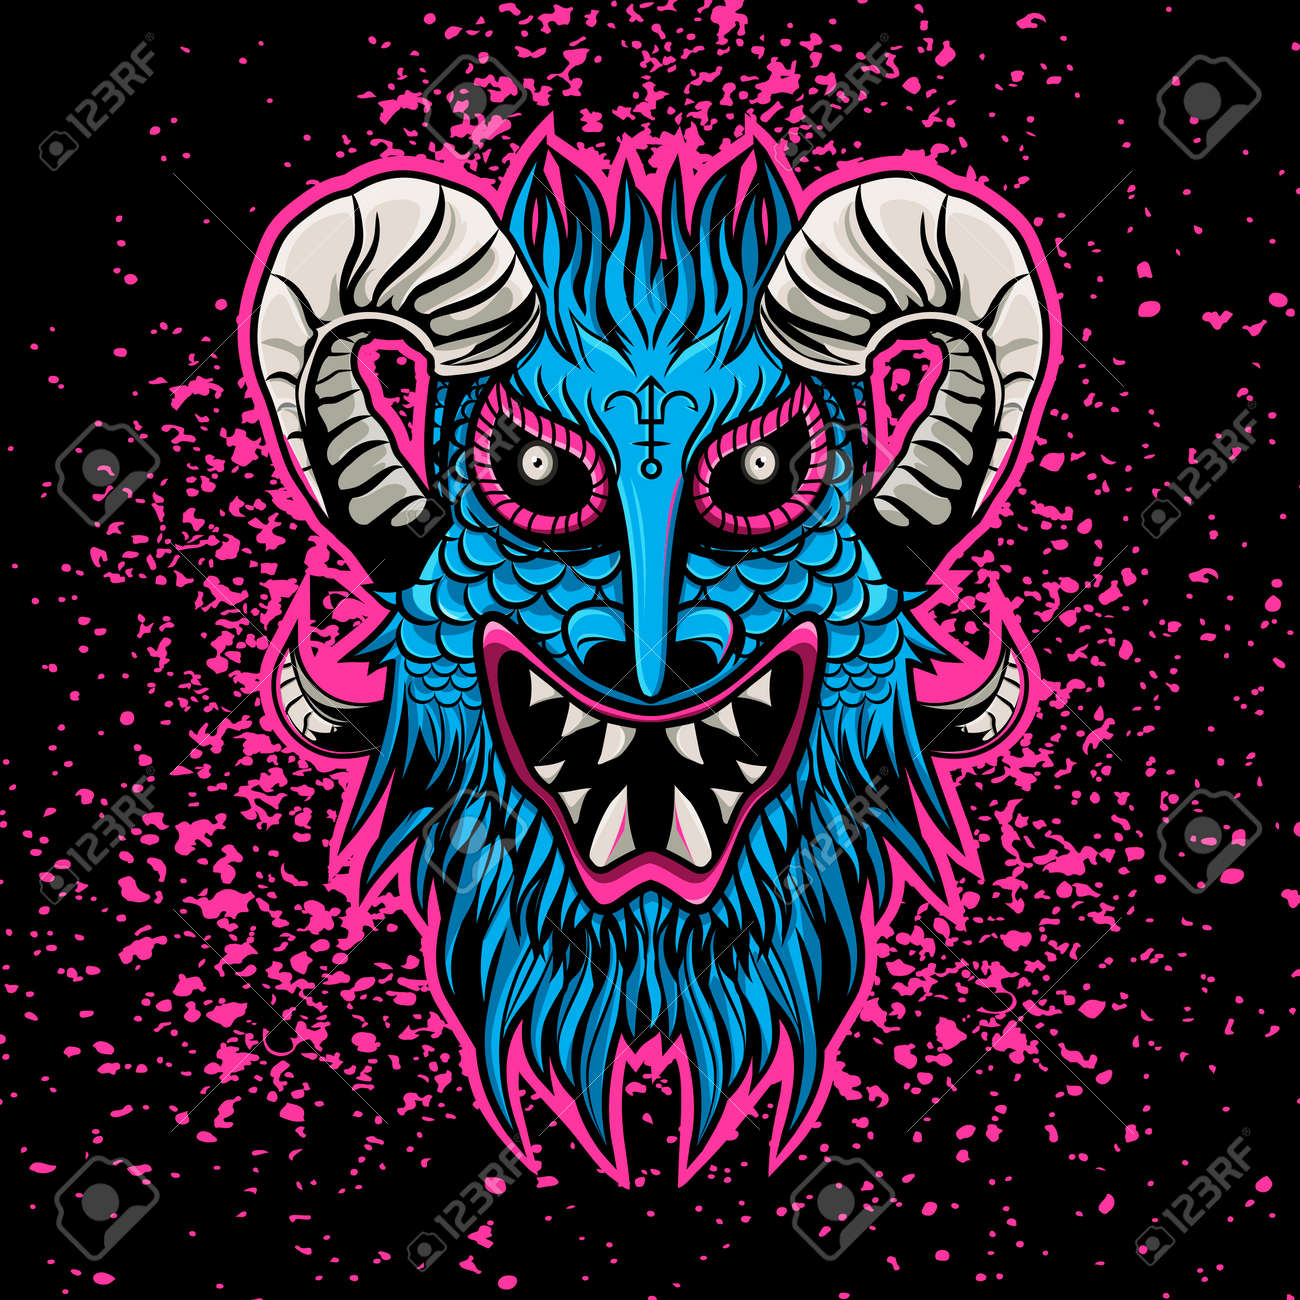 Pink blue angry devil 666 satan mascote flat design Stock Vector - 88856565